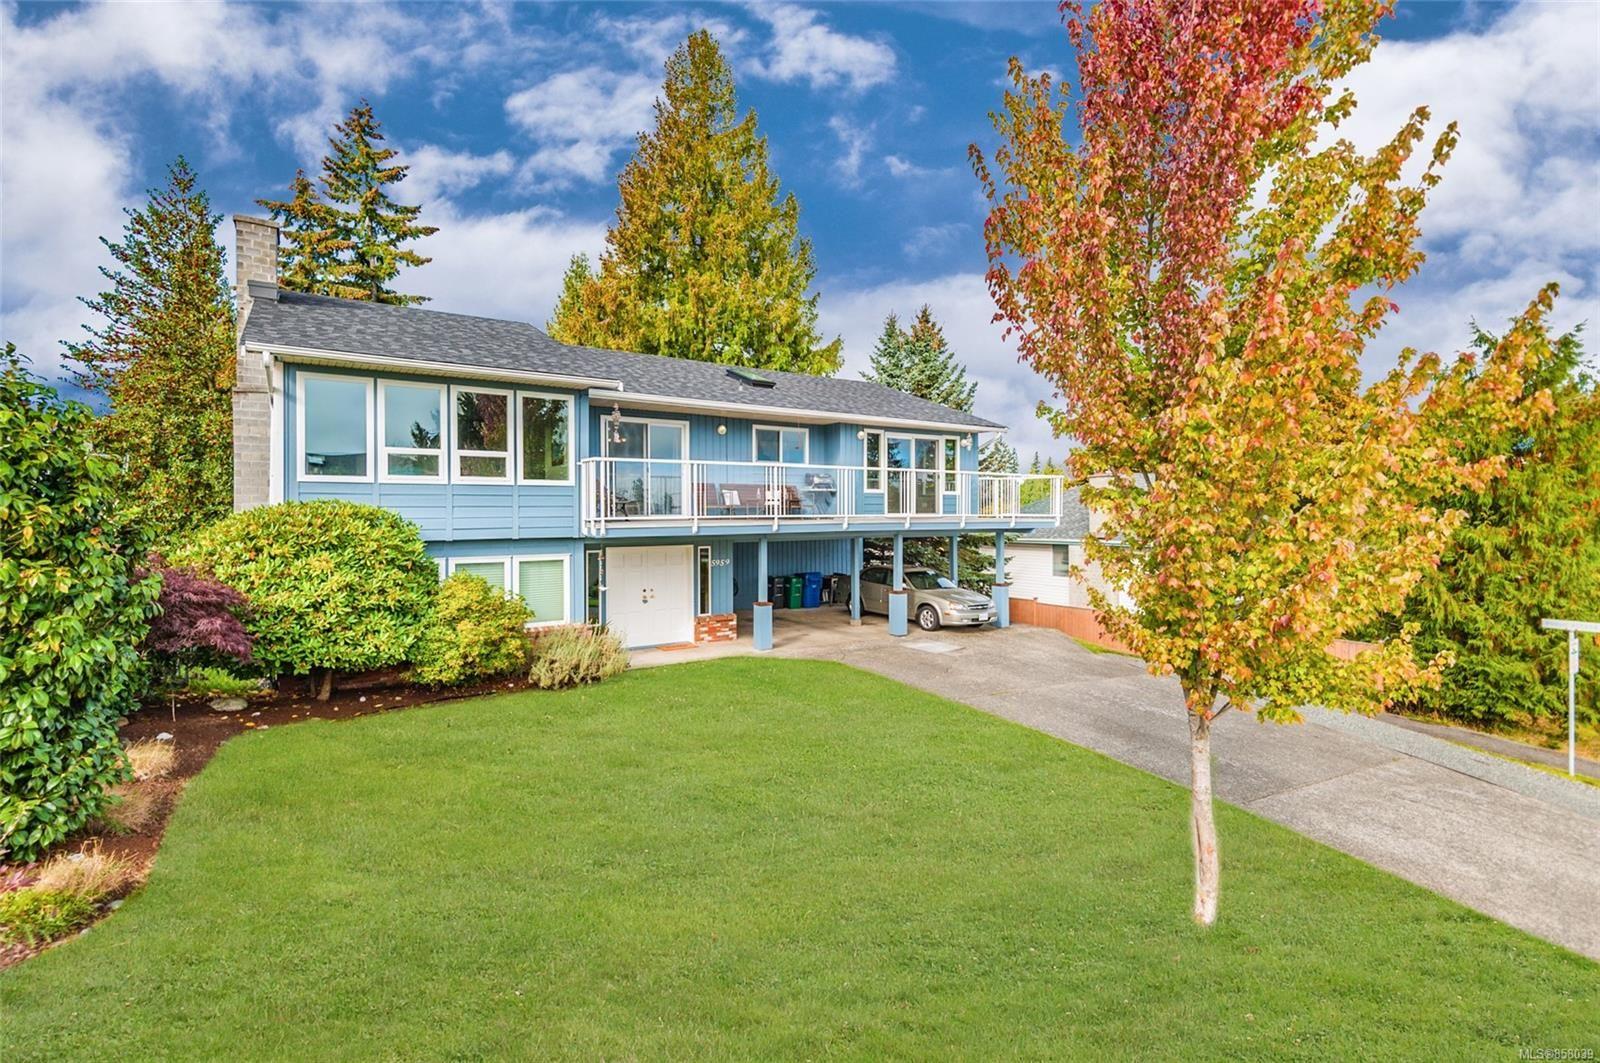 Main Photo: 5959 Schooner Way in : Na North Nanaimo House for sale (Nanaimo)  : MLS®# 858039